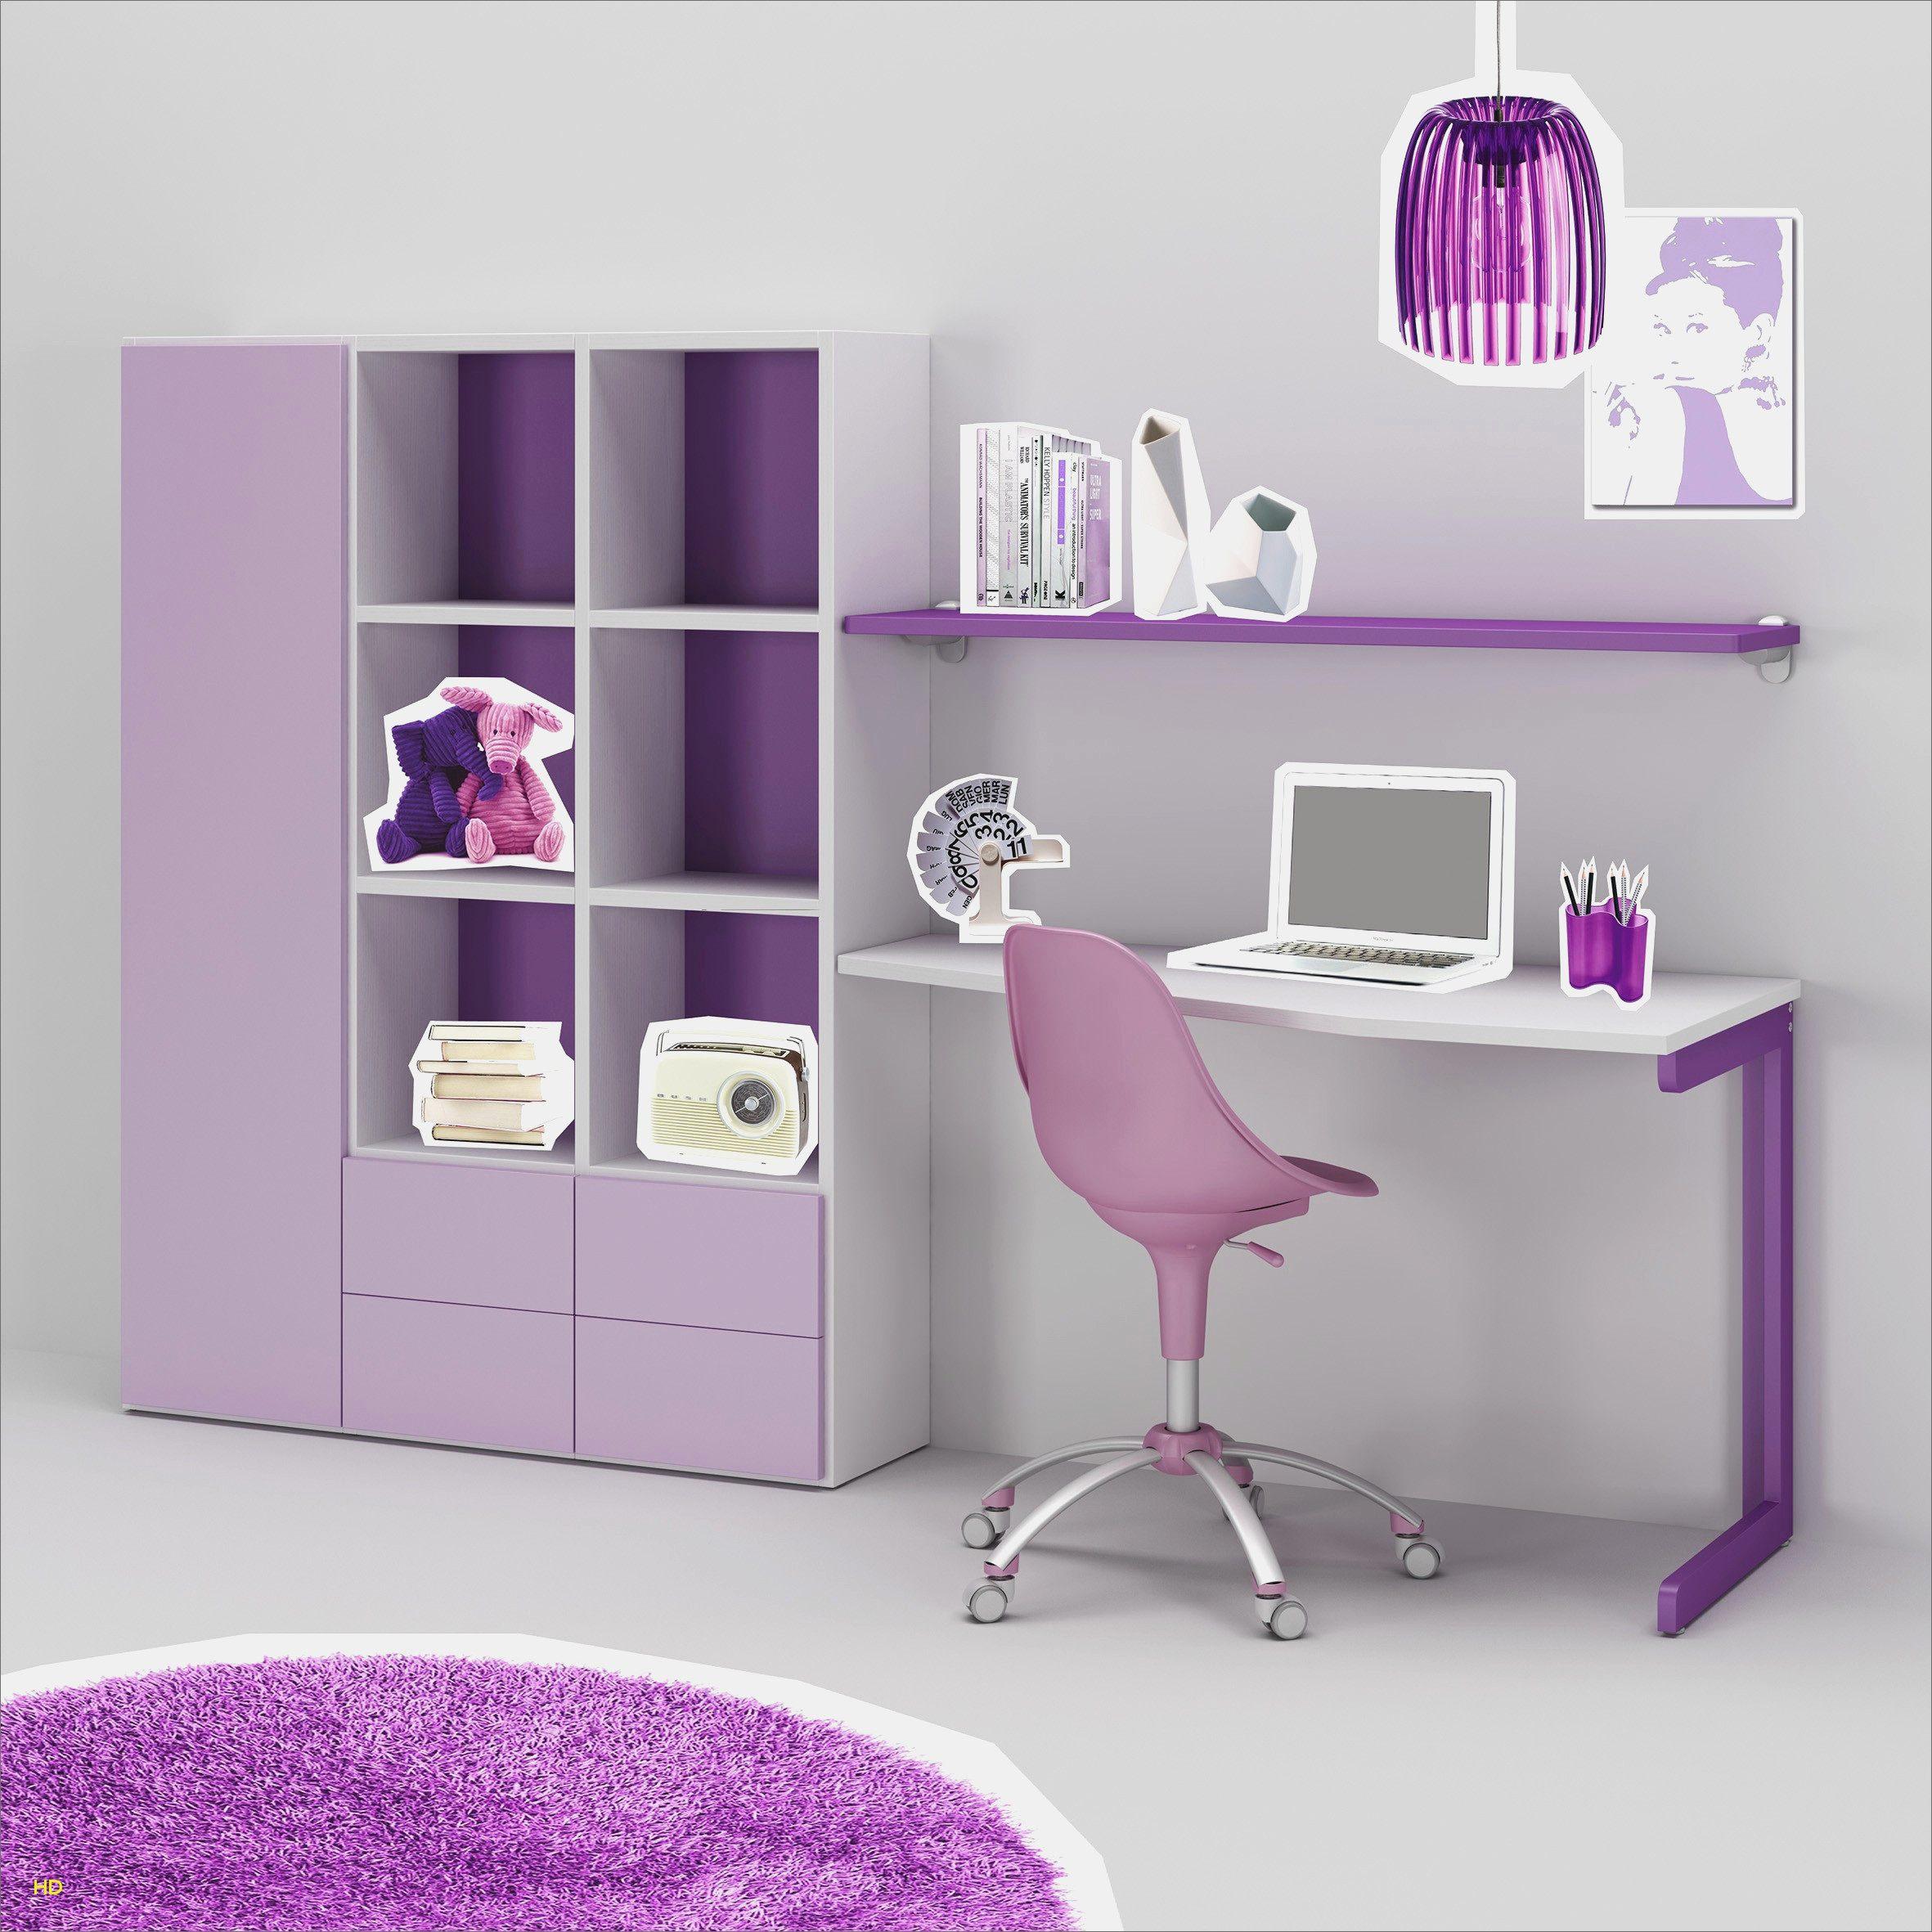 Belle Ikea Chambre Ado Lit Mezzanine Sur Lit Mezzanine 0 Lit